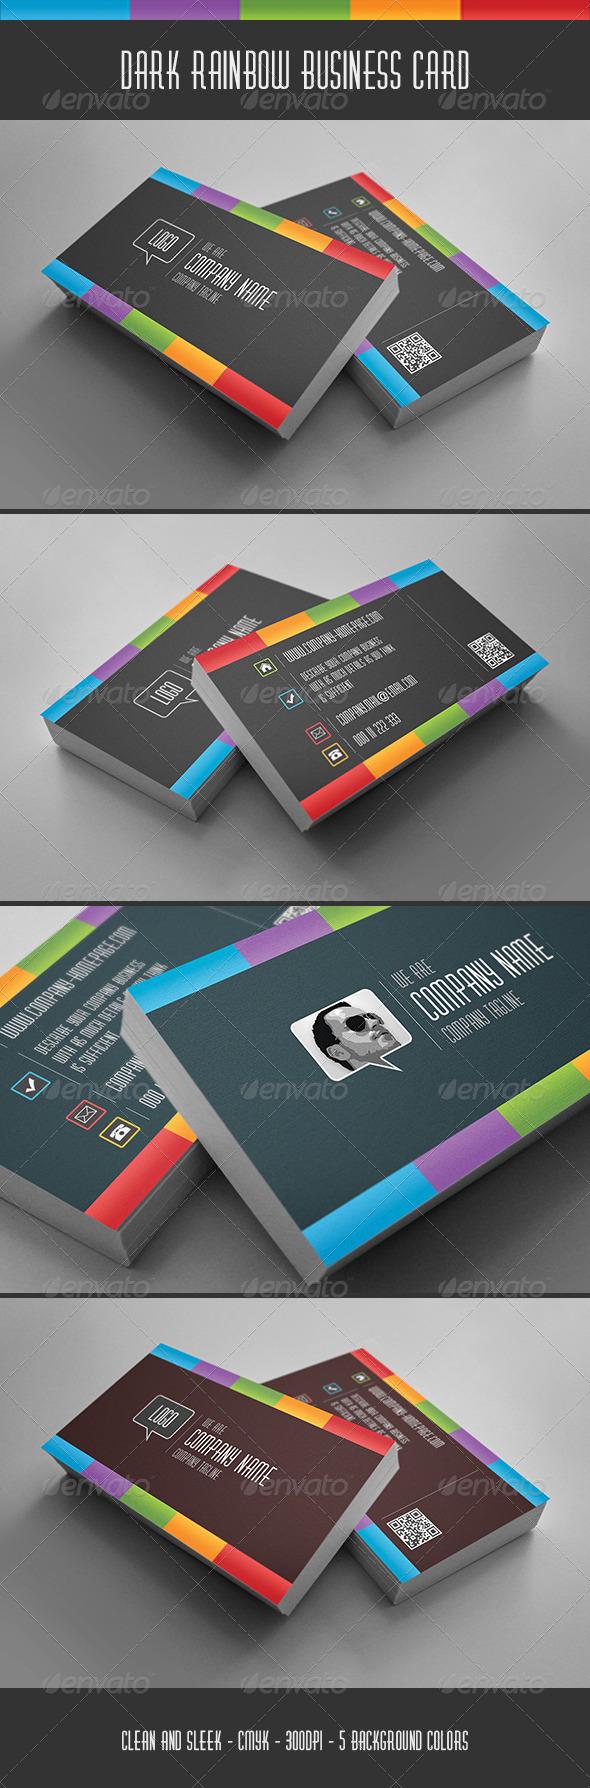 GraphicRiver Dark Rainbow Business Card 5841026